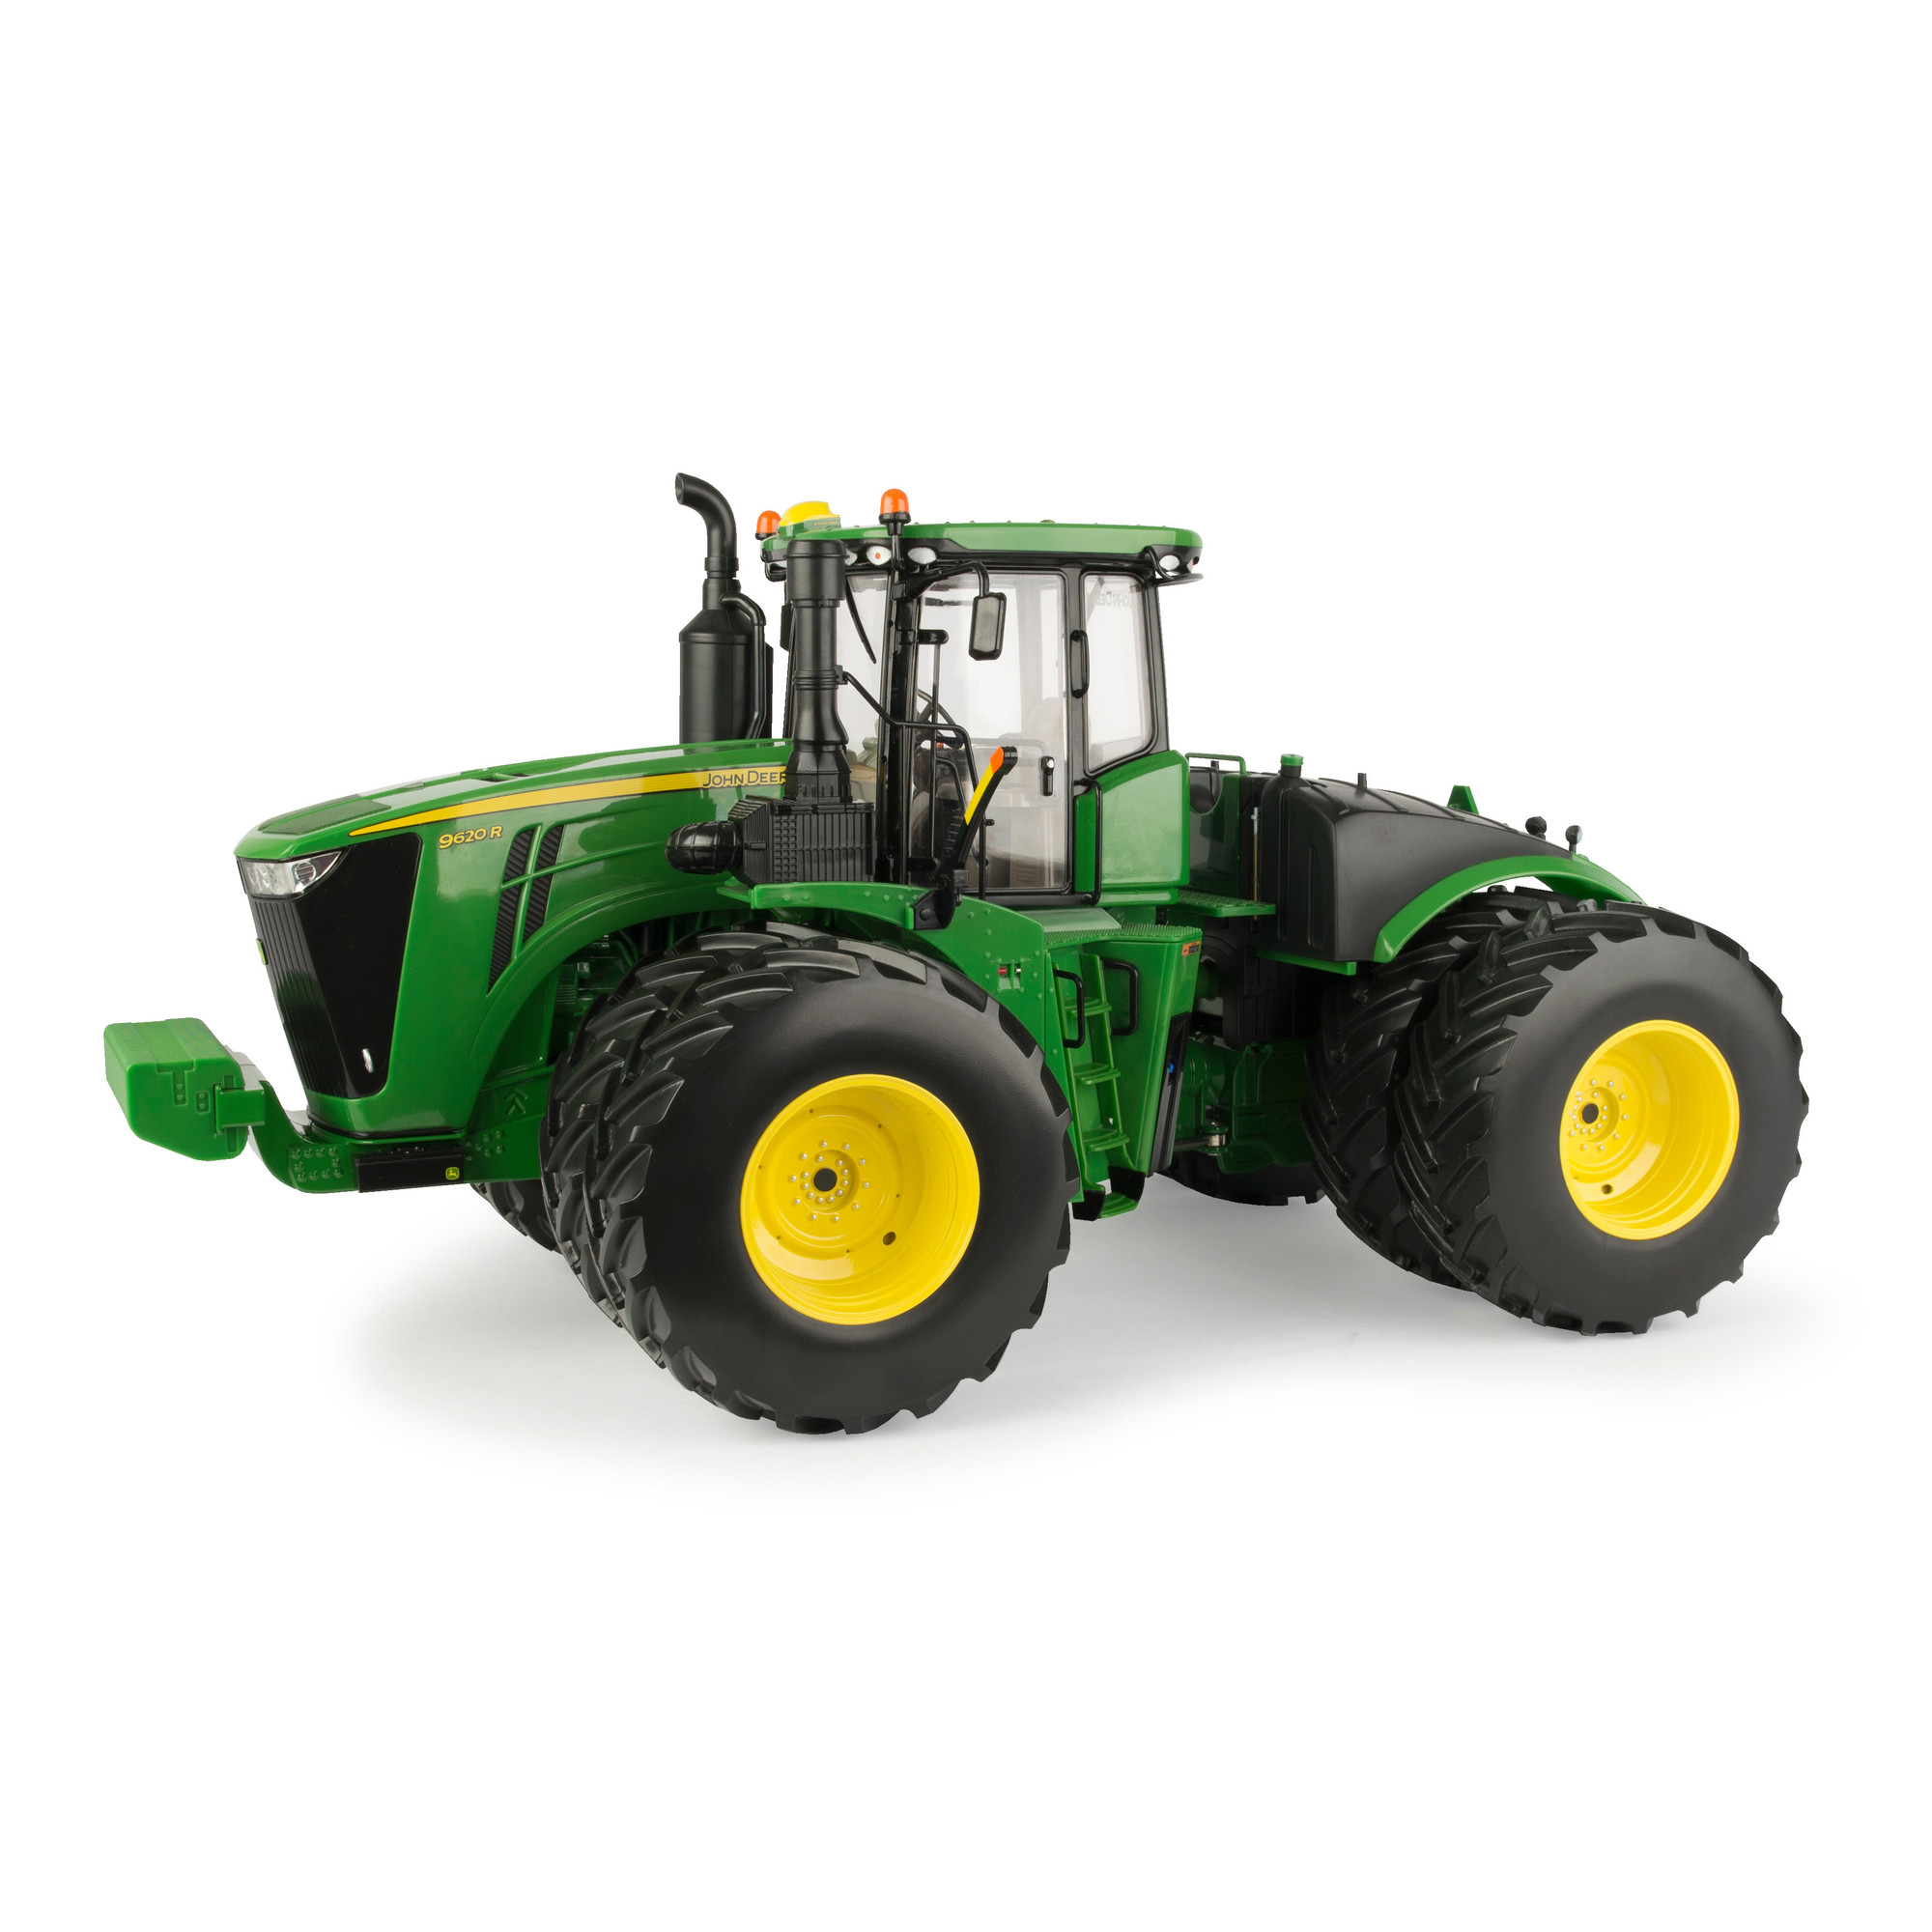 1:16 John Deere 9620R Prestige Tractor by Tomy Inc